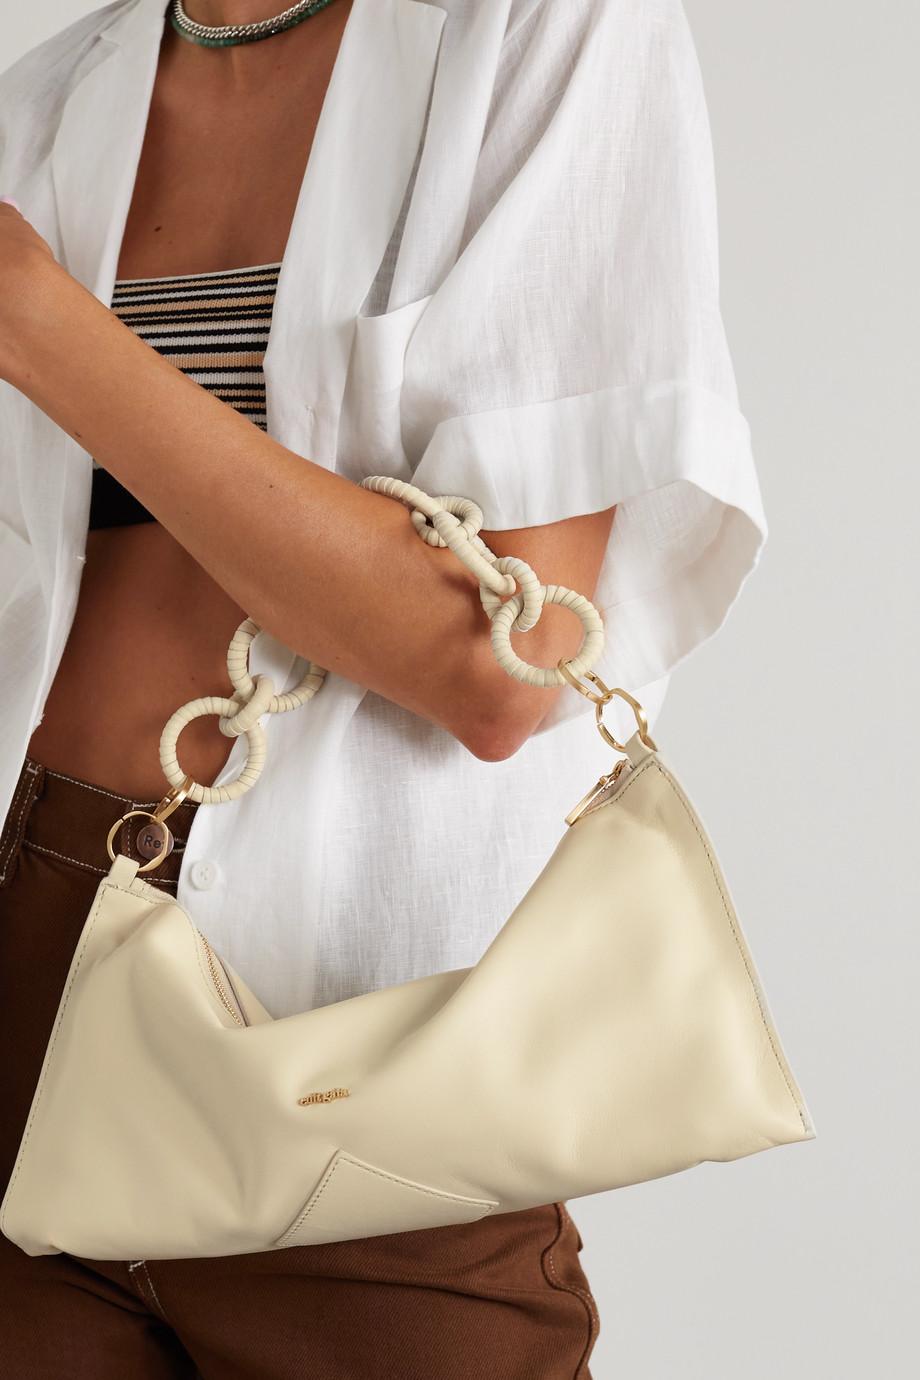 Cult Gaia Hera mini leather shoulder bag